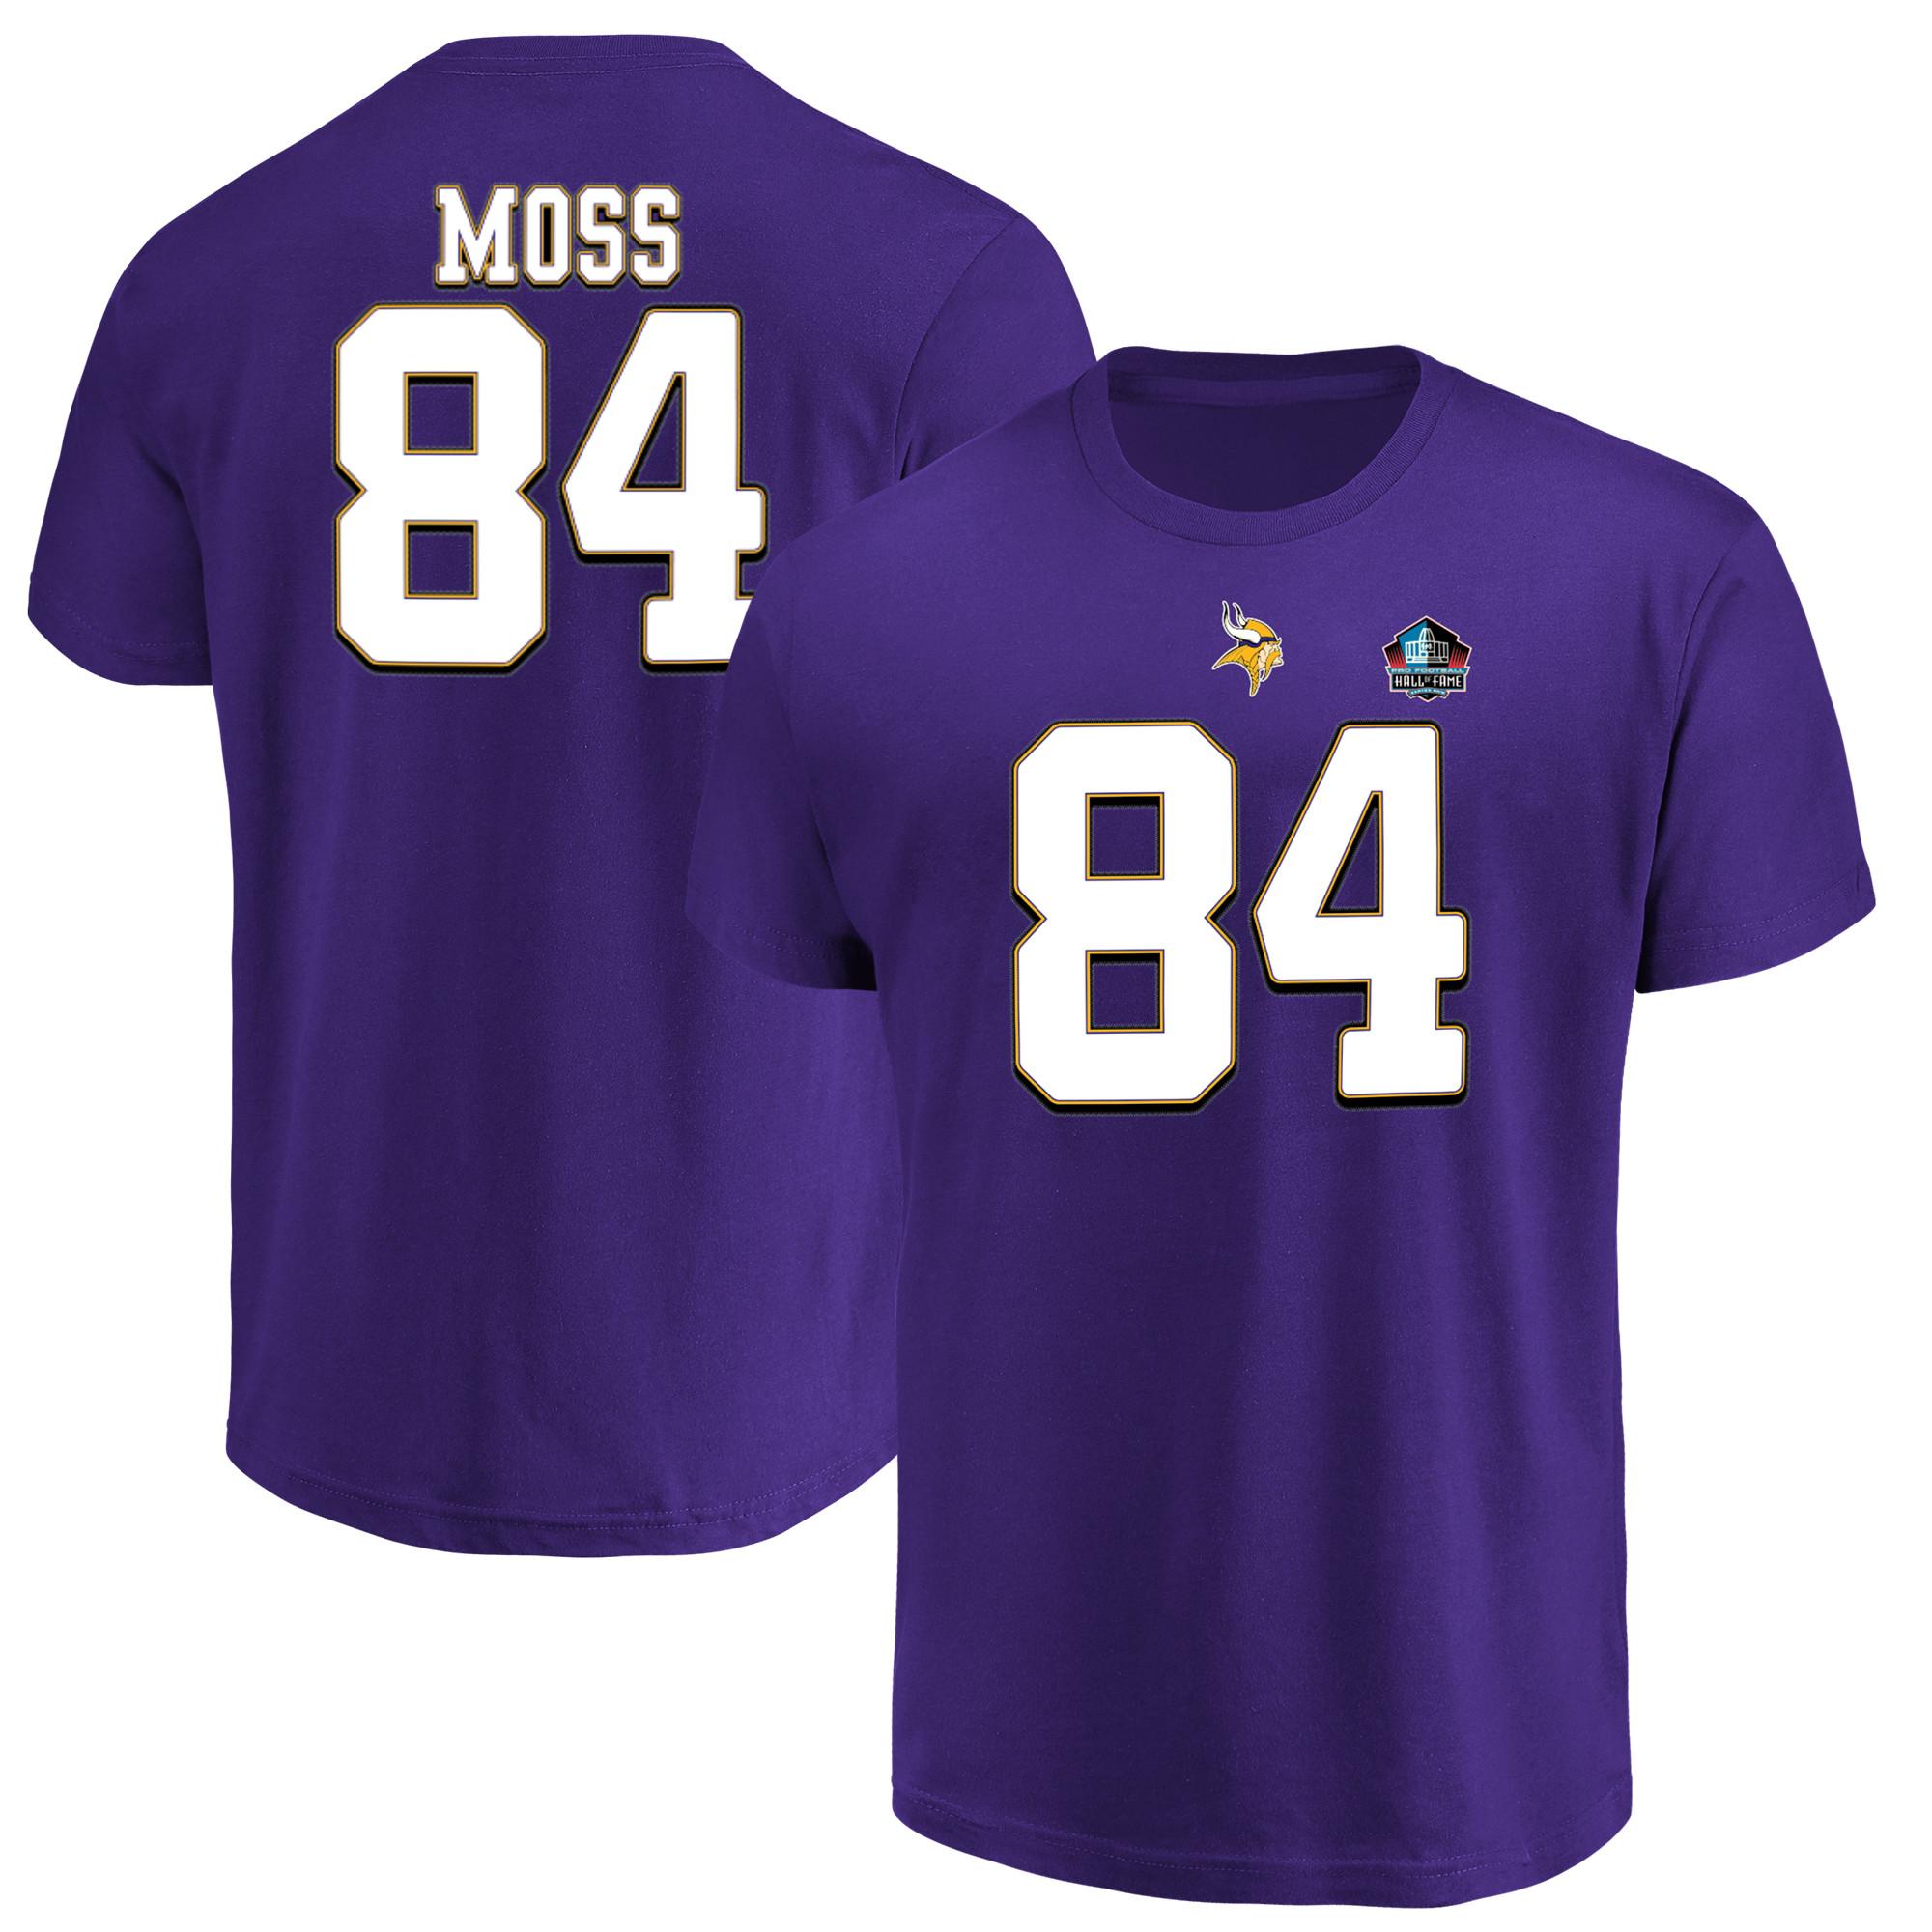 Randy Moss Minnesota Vikings Majestic Hall of Fame Inductee Player Name & Number T-Shirt - Purple